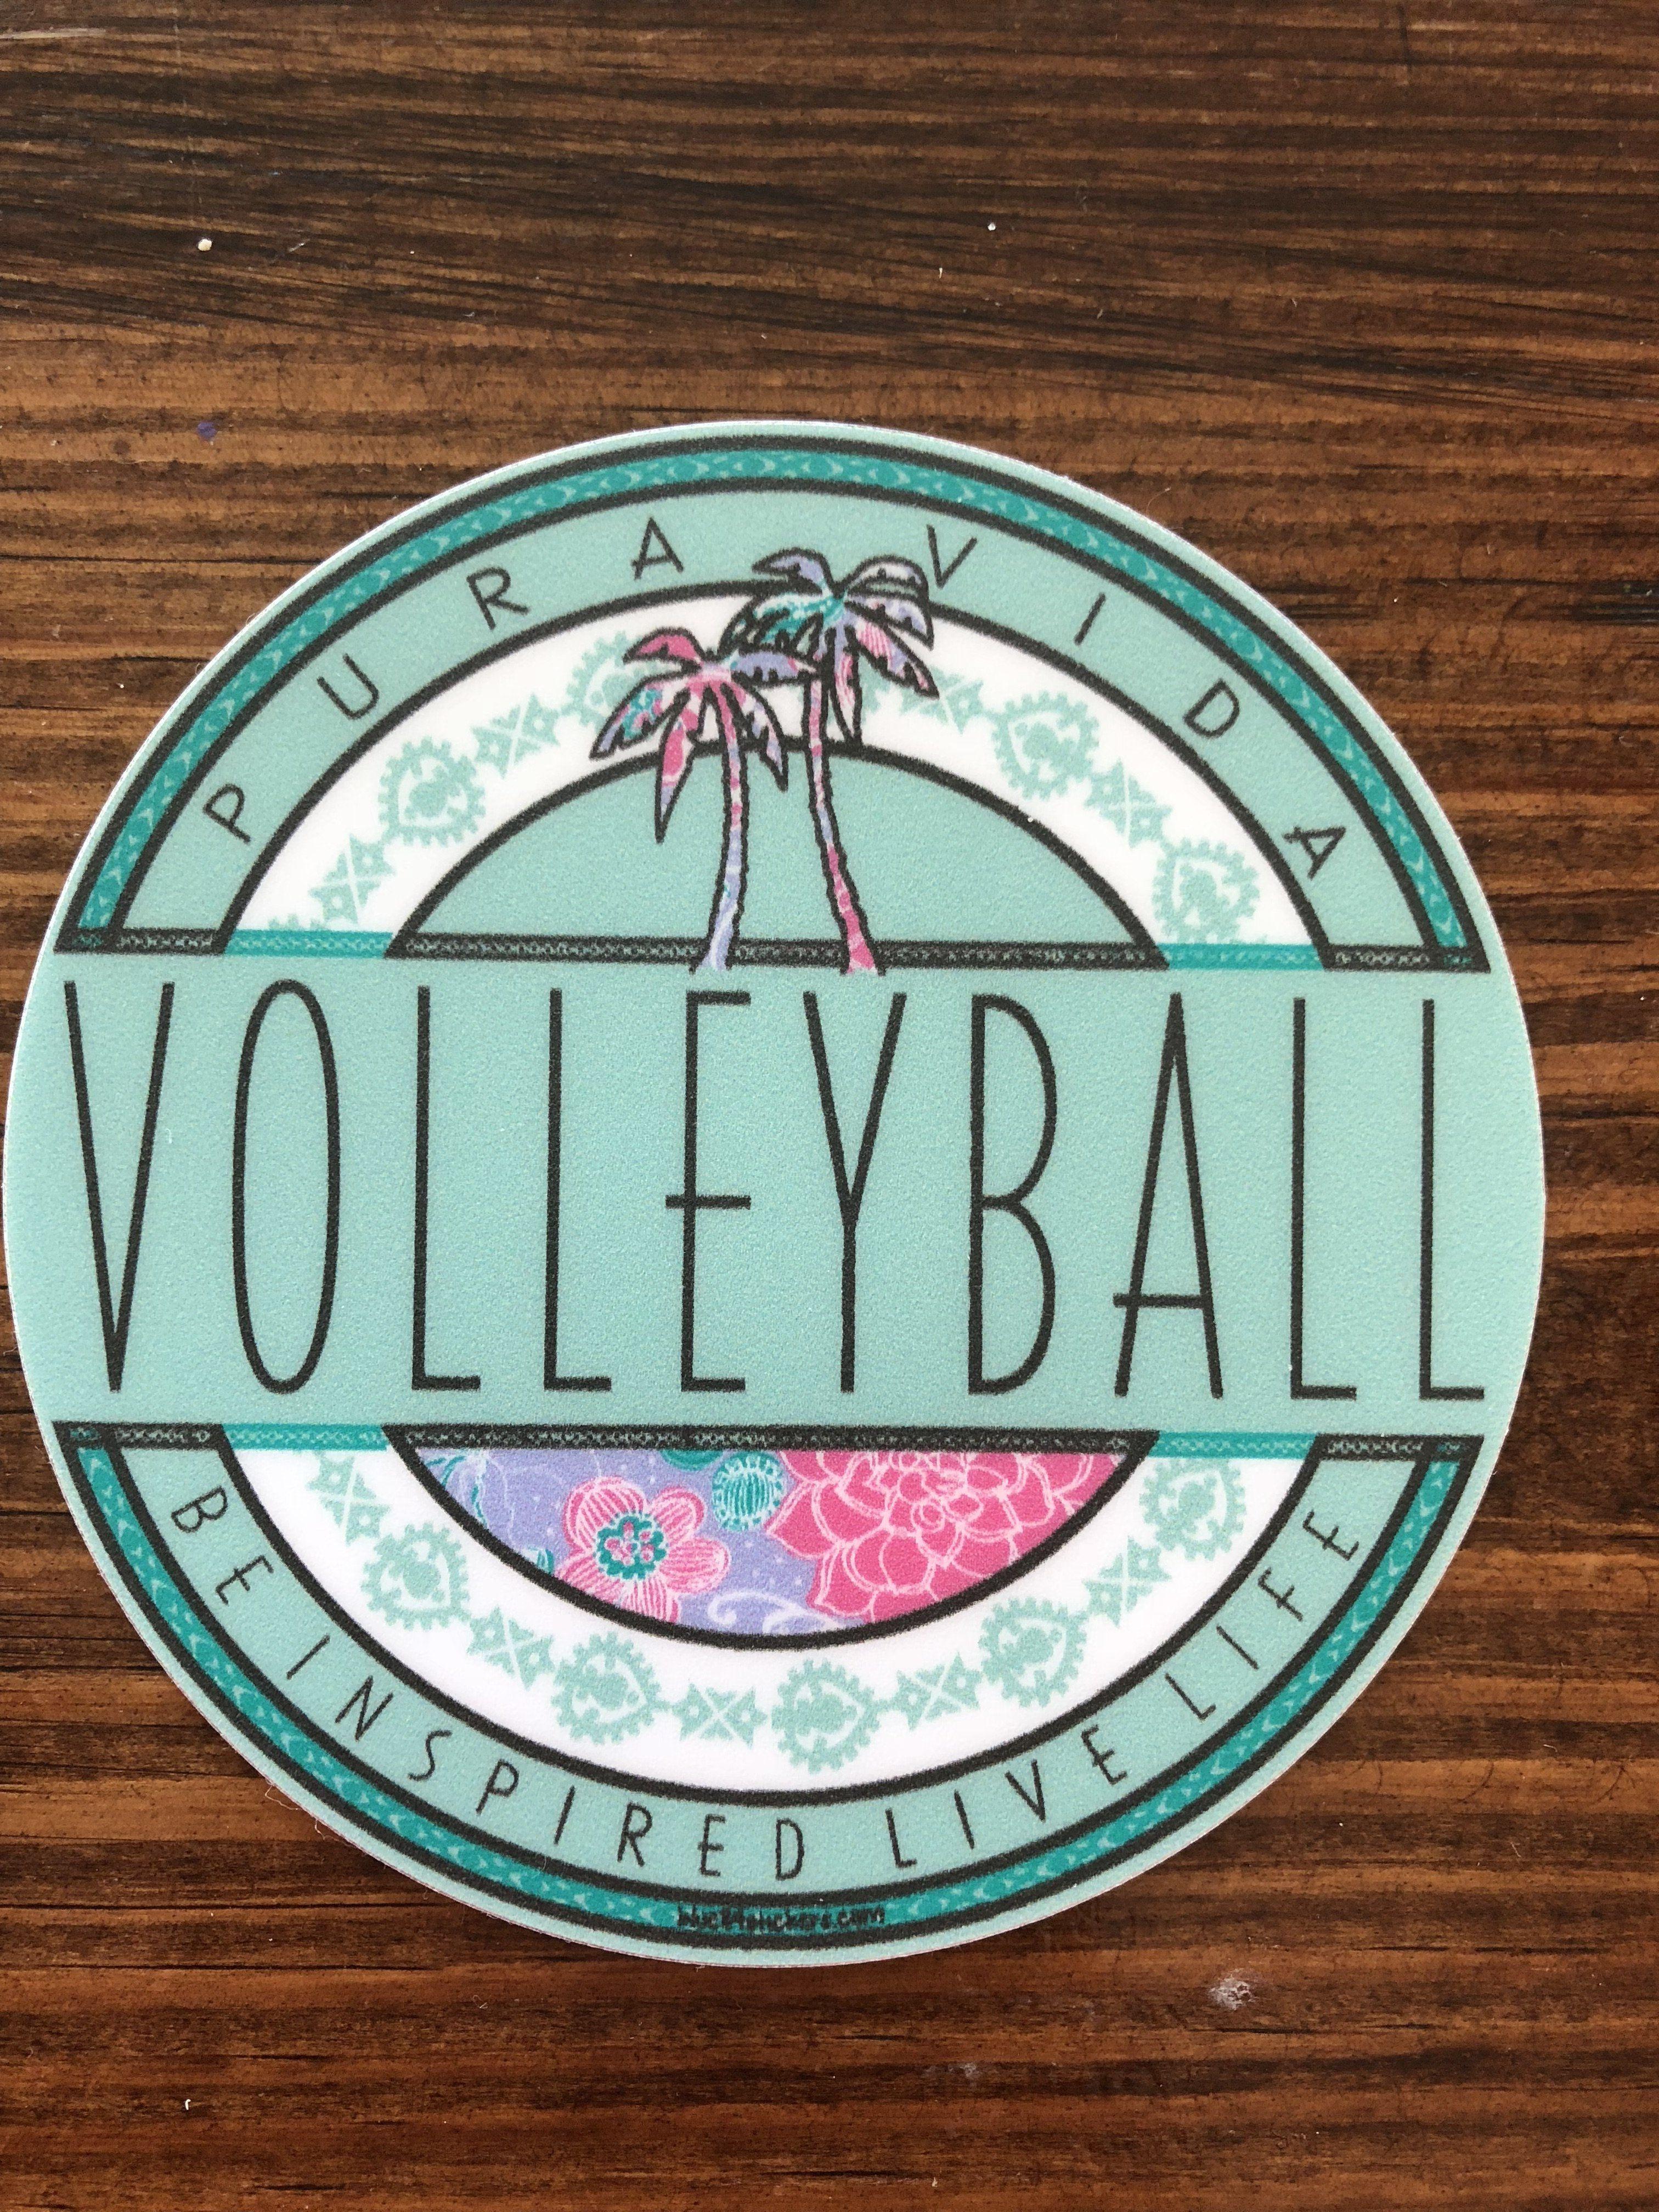 Pura Vida Volleyball Round Sticker Preppy Stickers Hydroflask Stickers Iphone Stickers